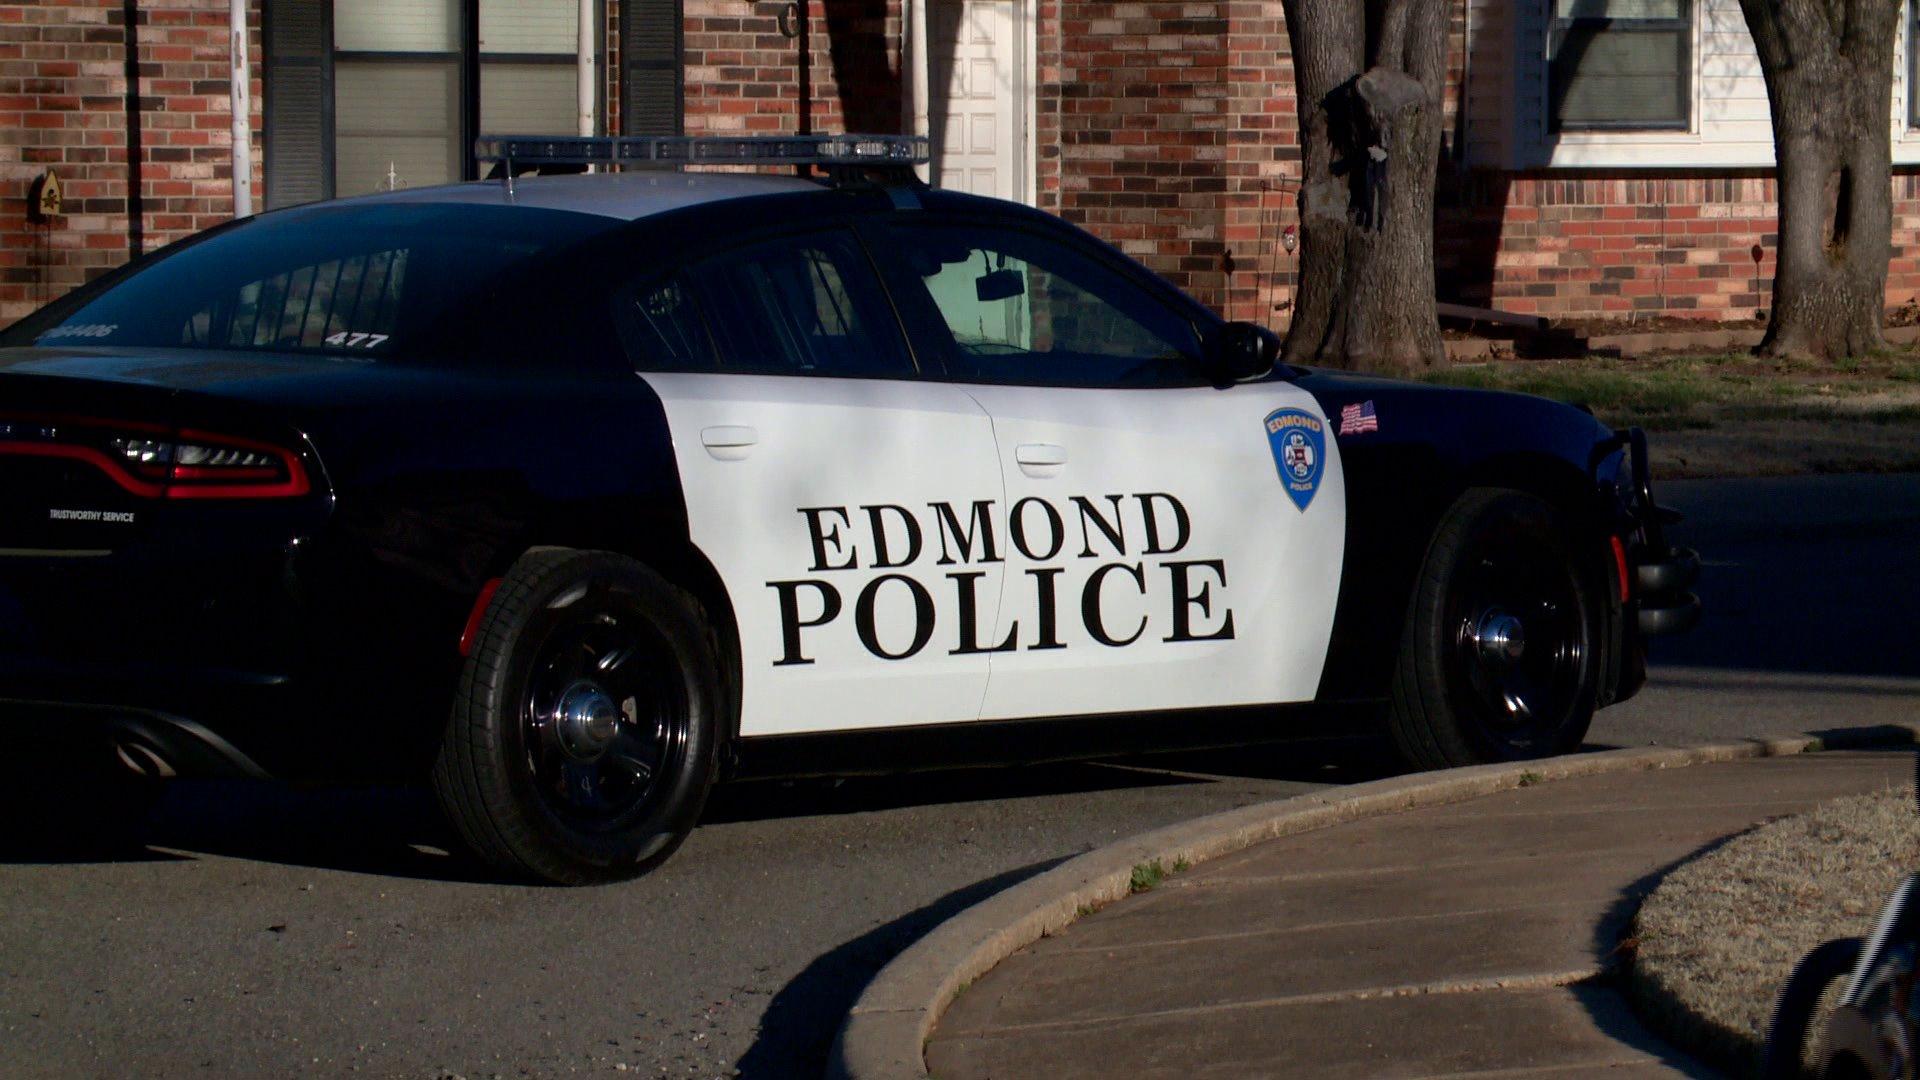 Edmond police